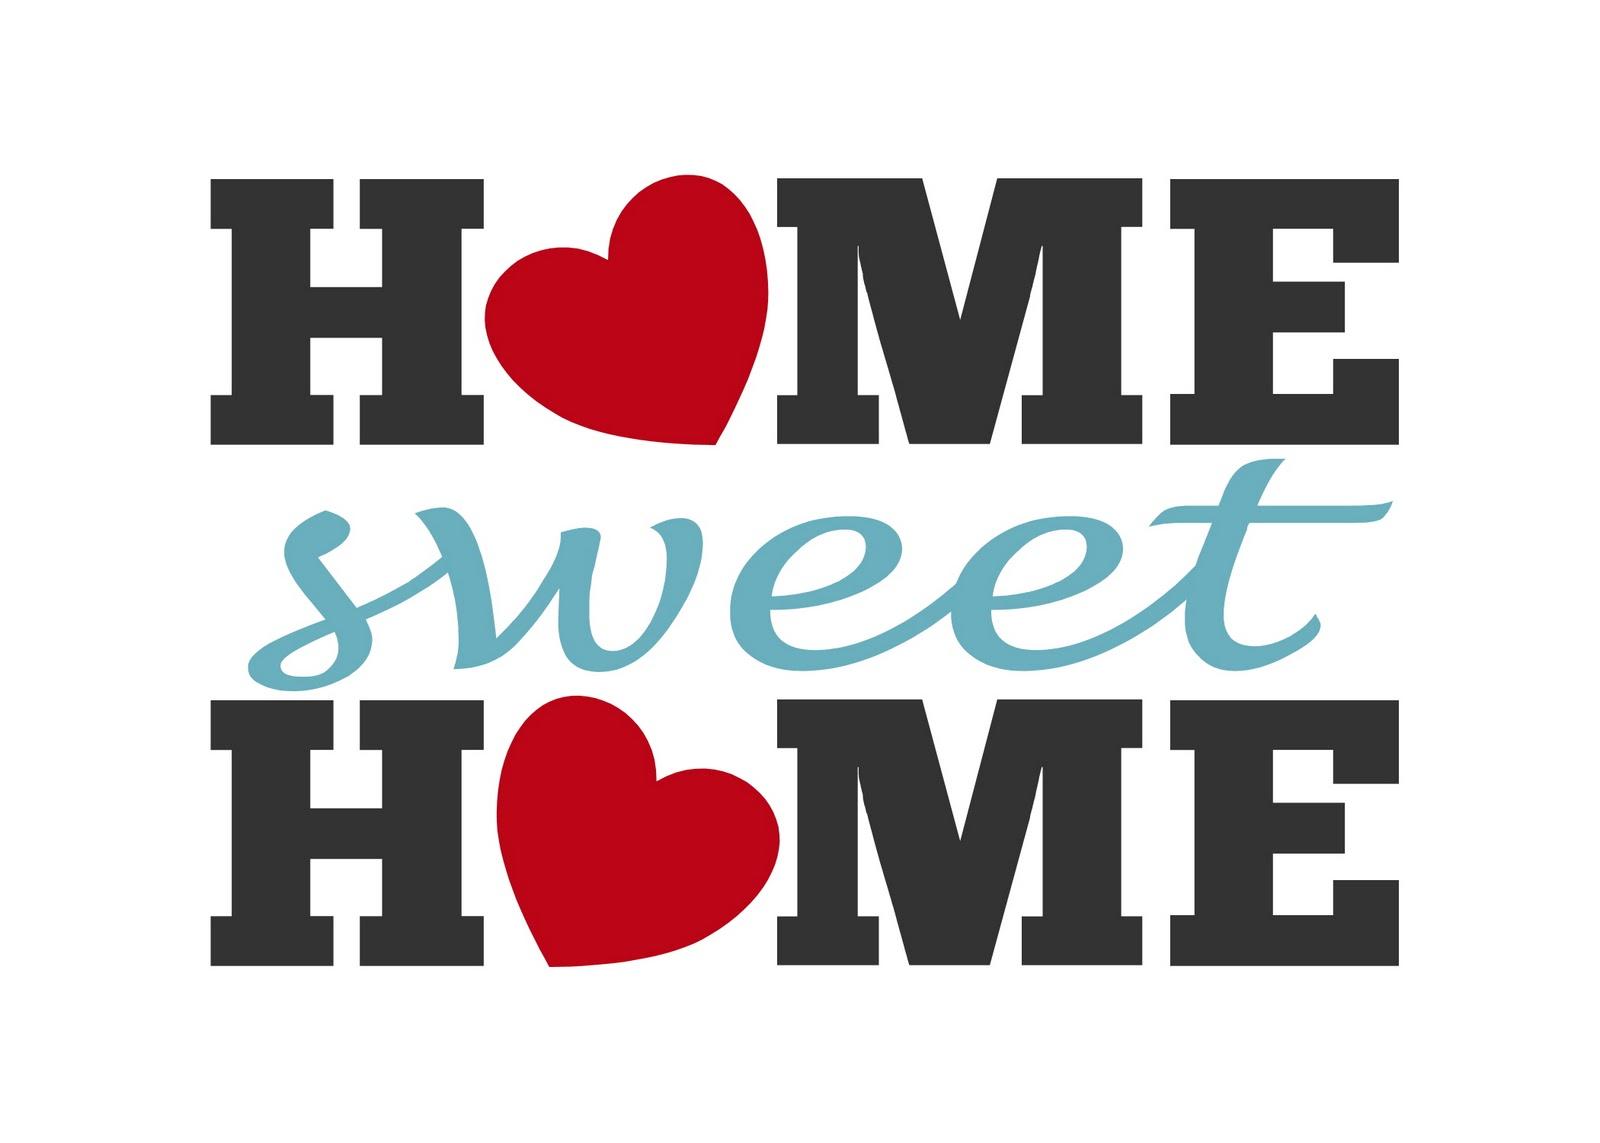 homemakin and decoratin adorable printables freebies. Black Bedroom Furniture Sets. Home Design Ideas